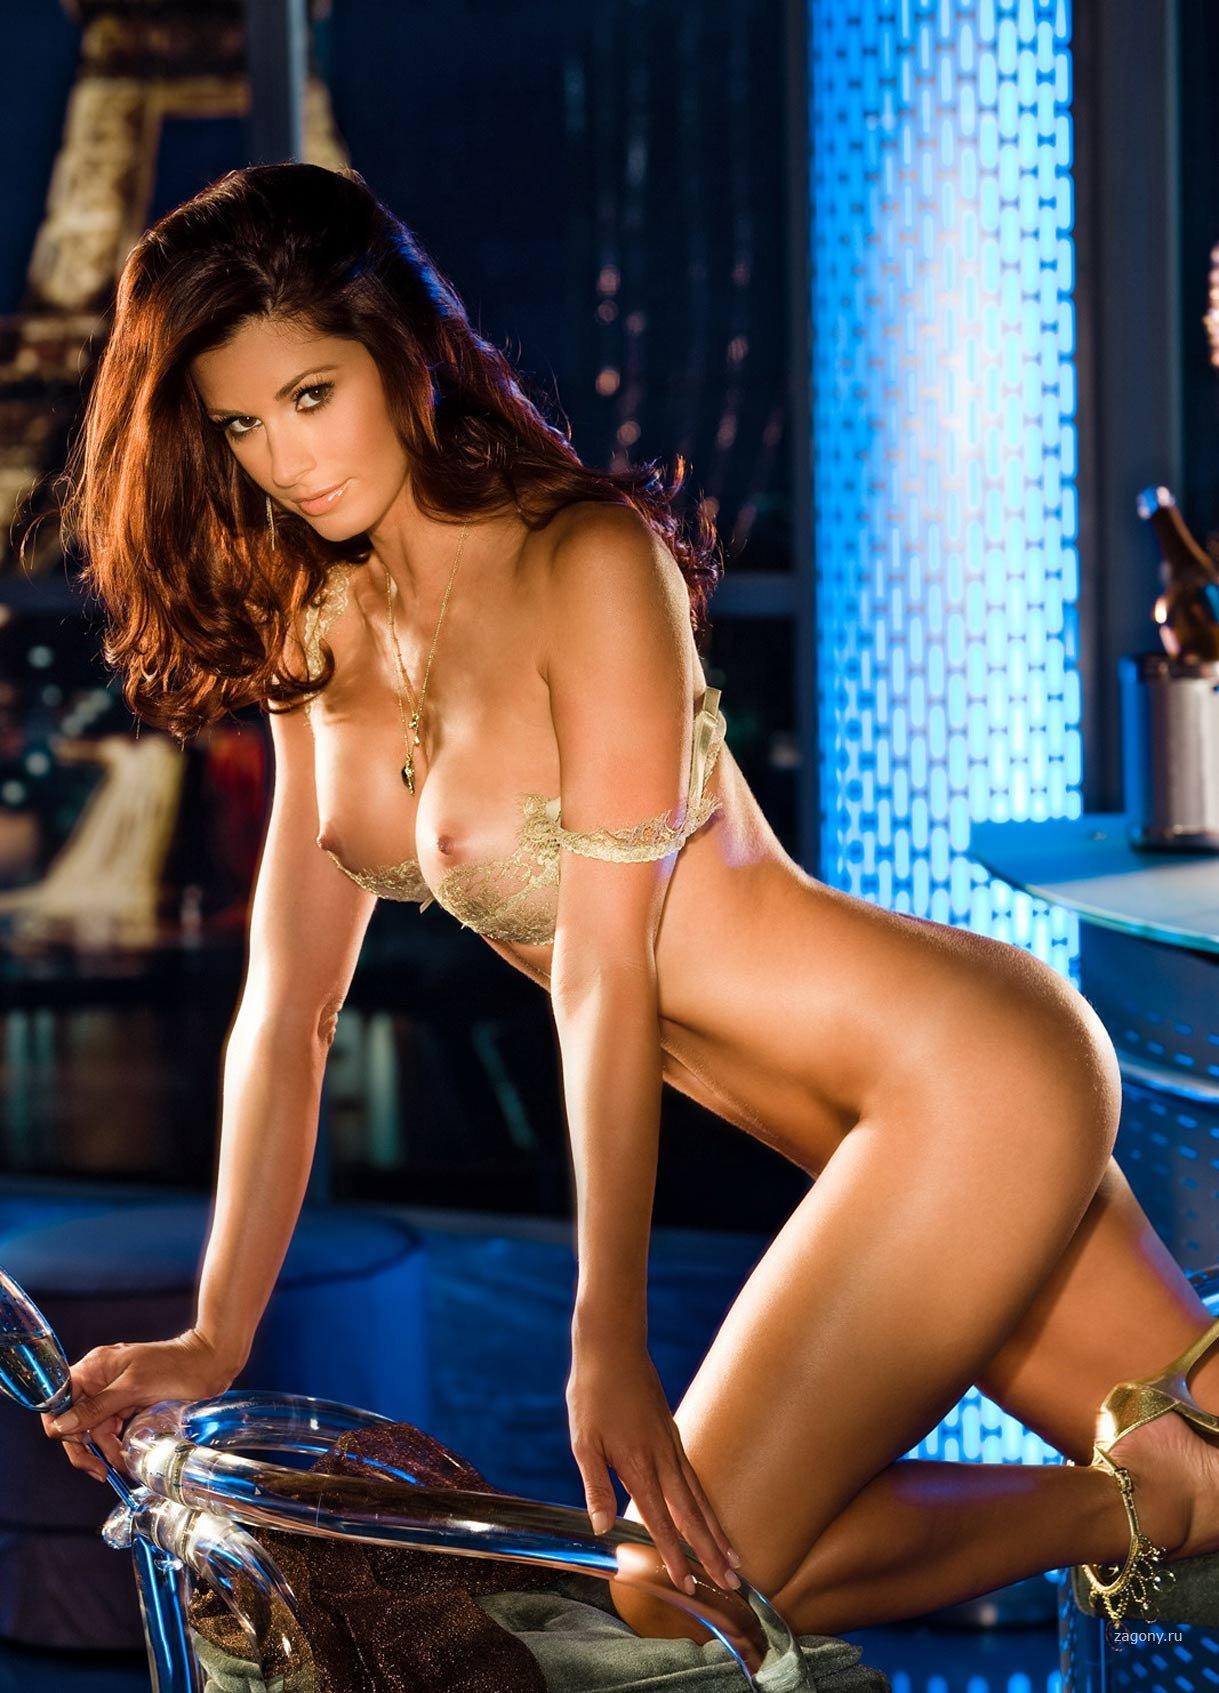 jaime-edmondson-fucked-topless-pictures-upset-aishwarya